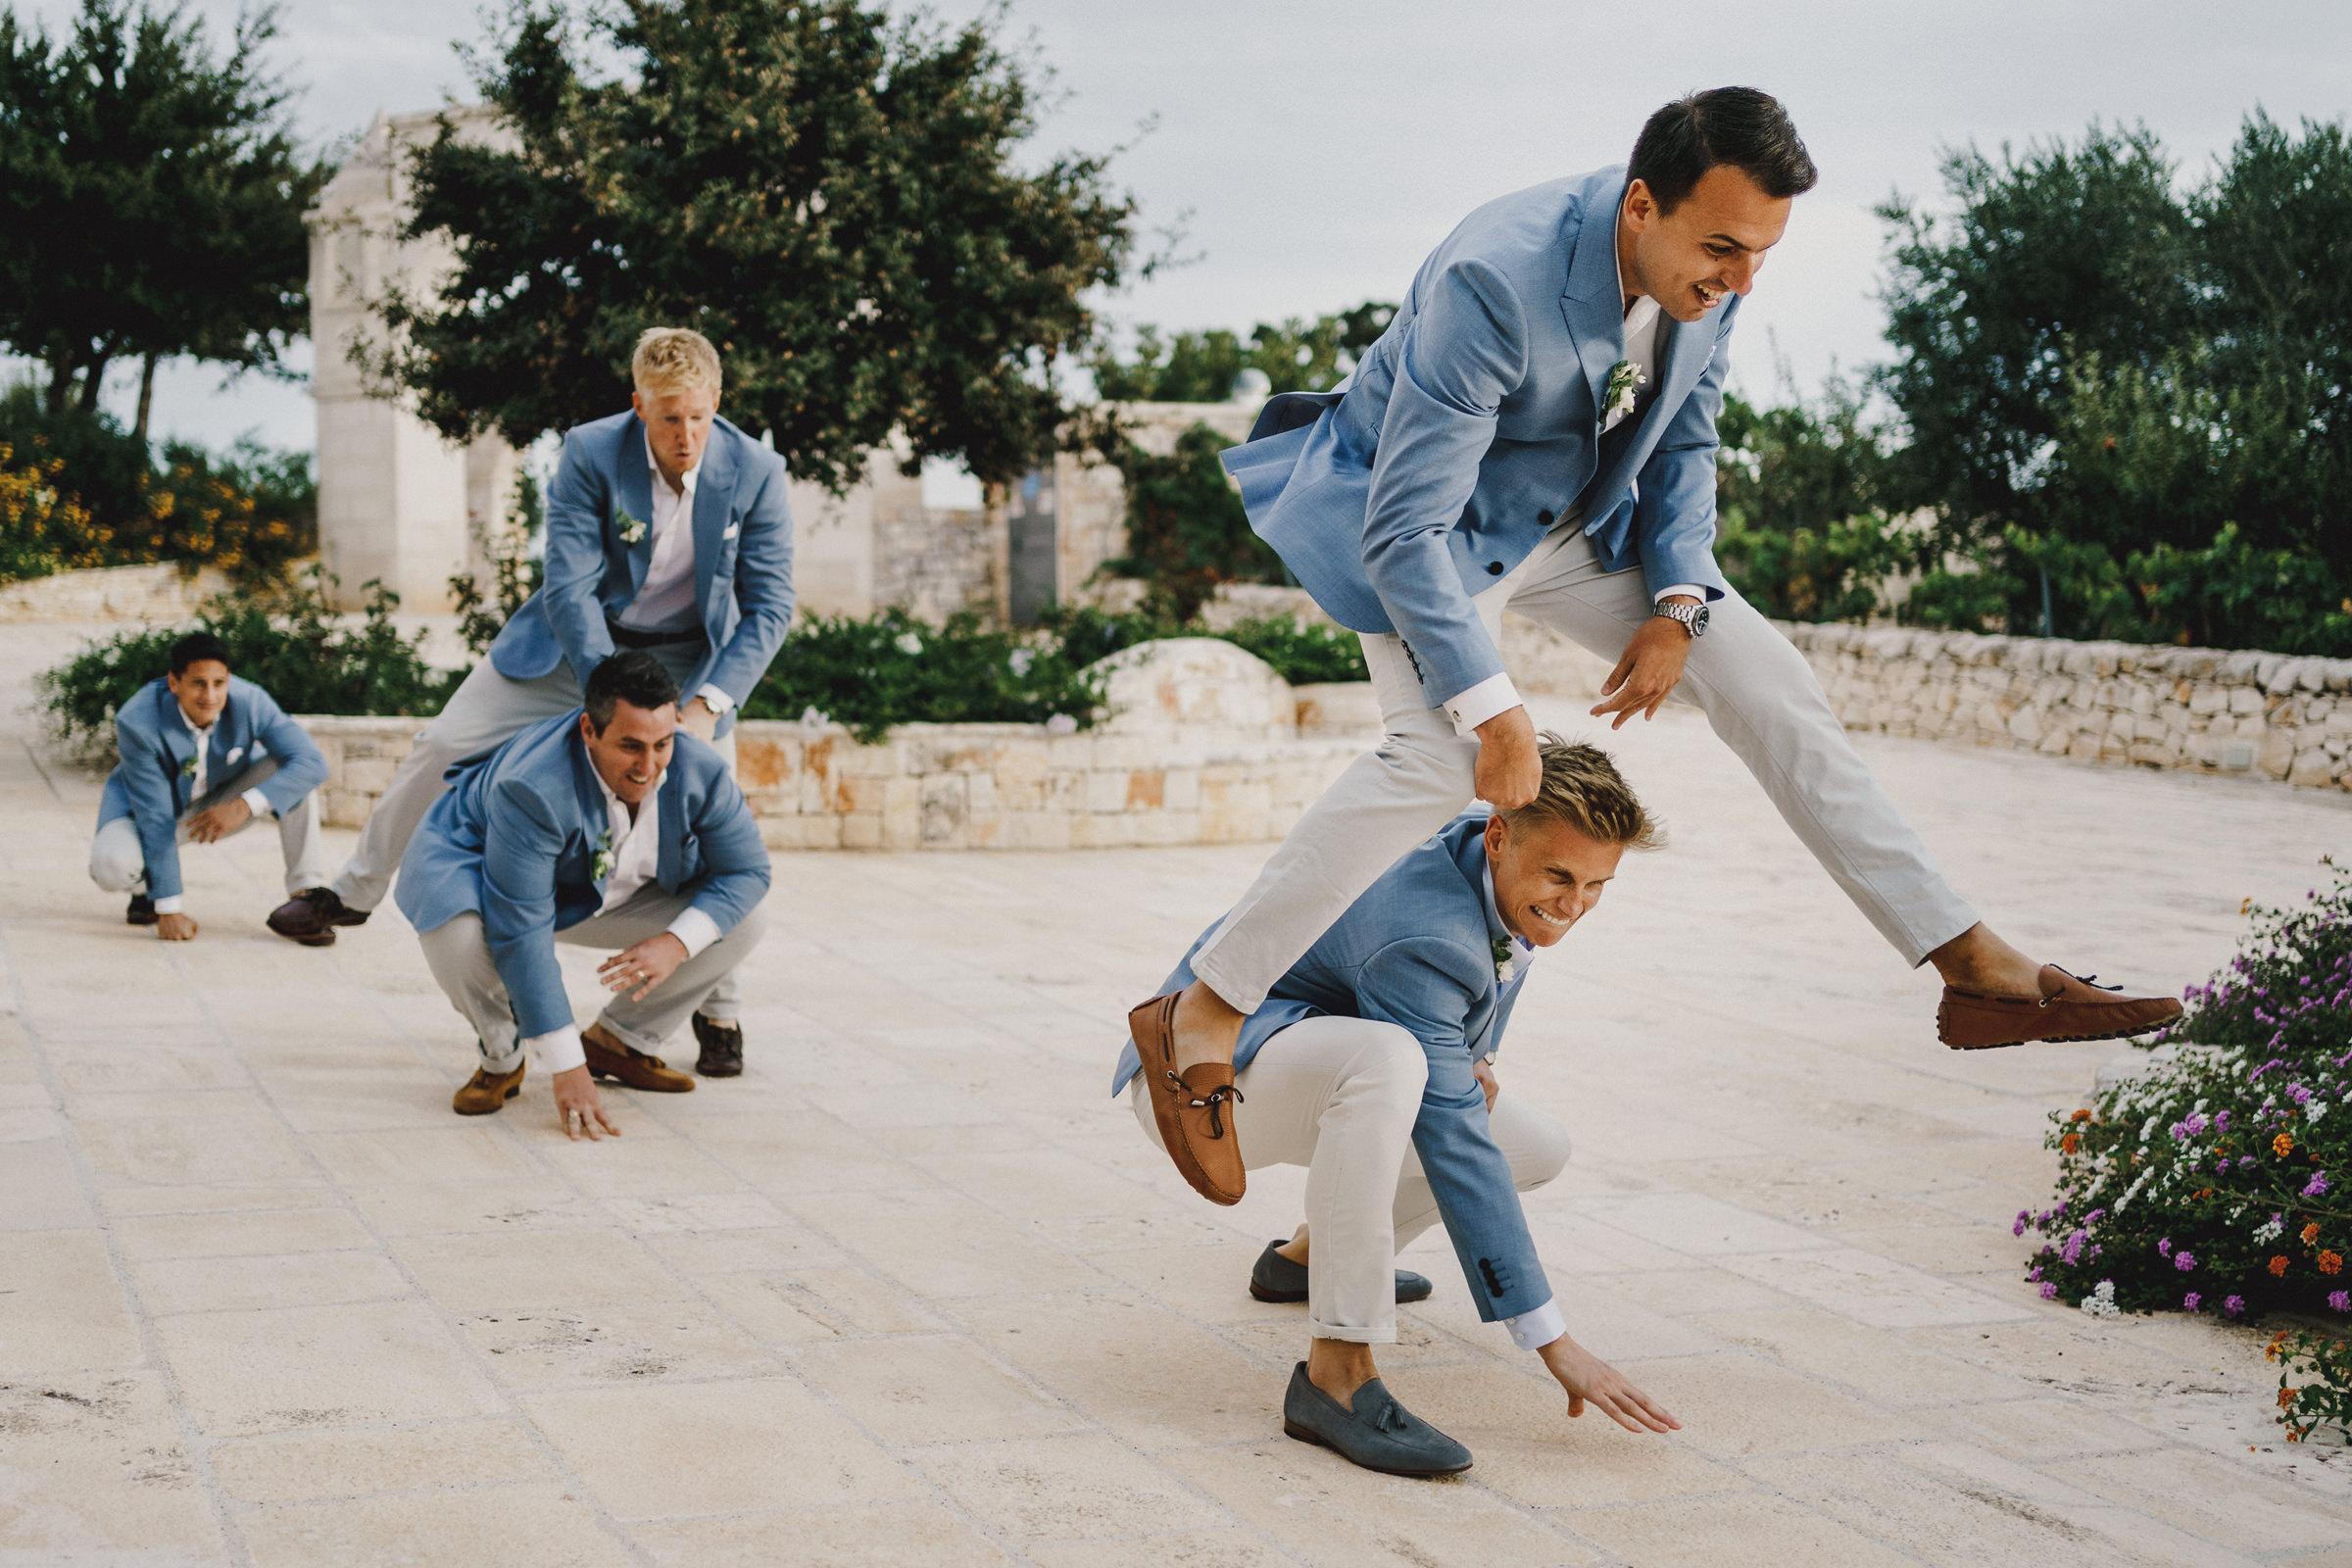 groomsmen-playing-leapfrog-2-miki-studios